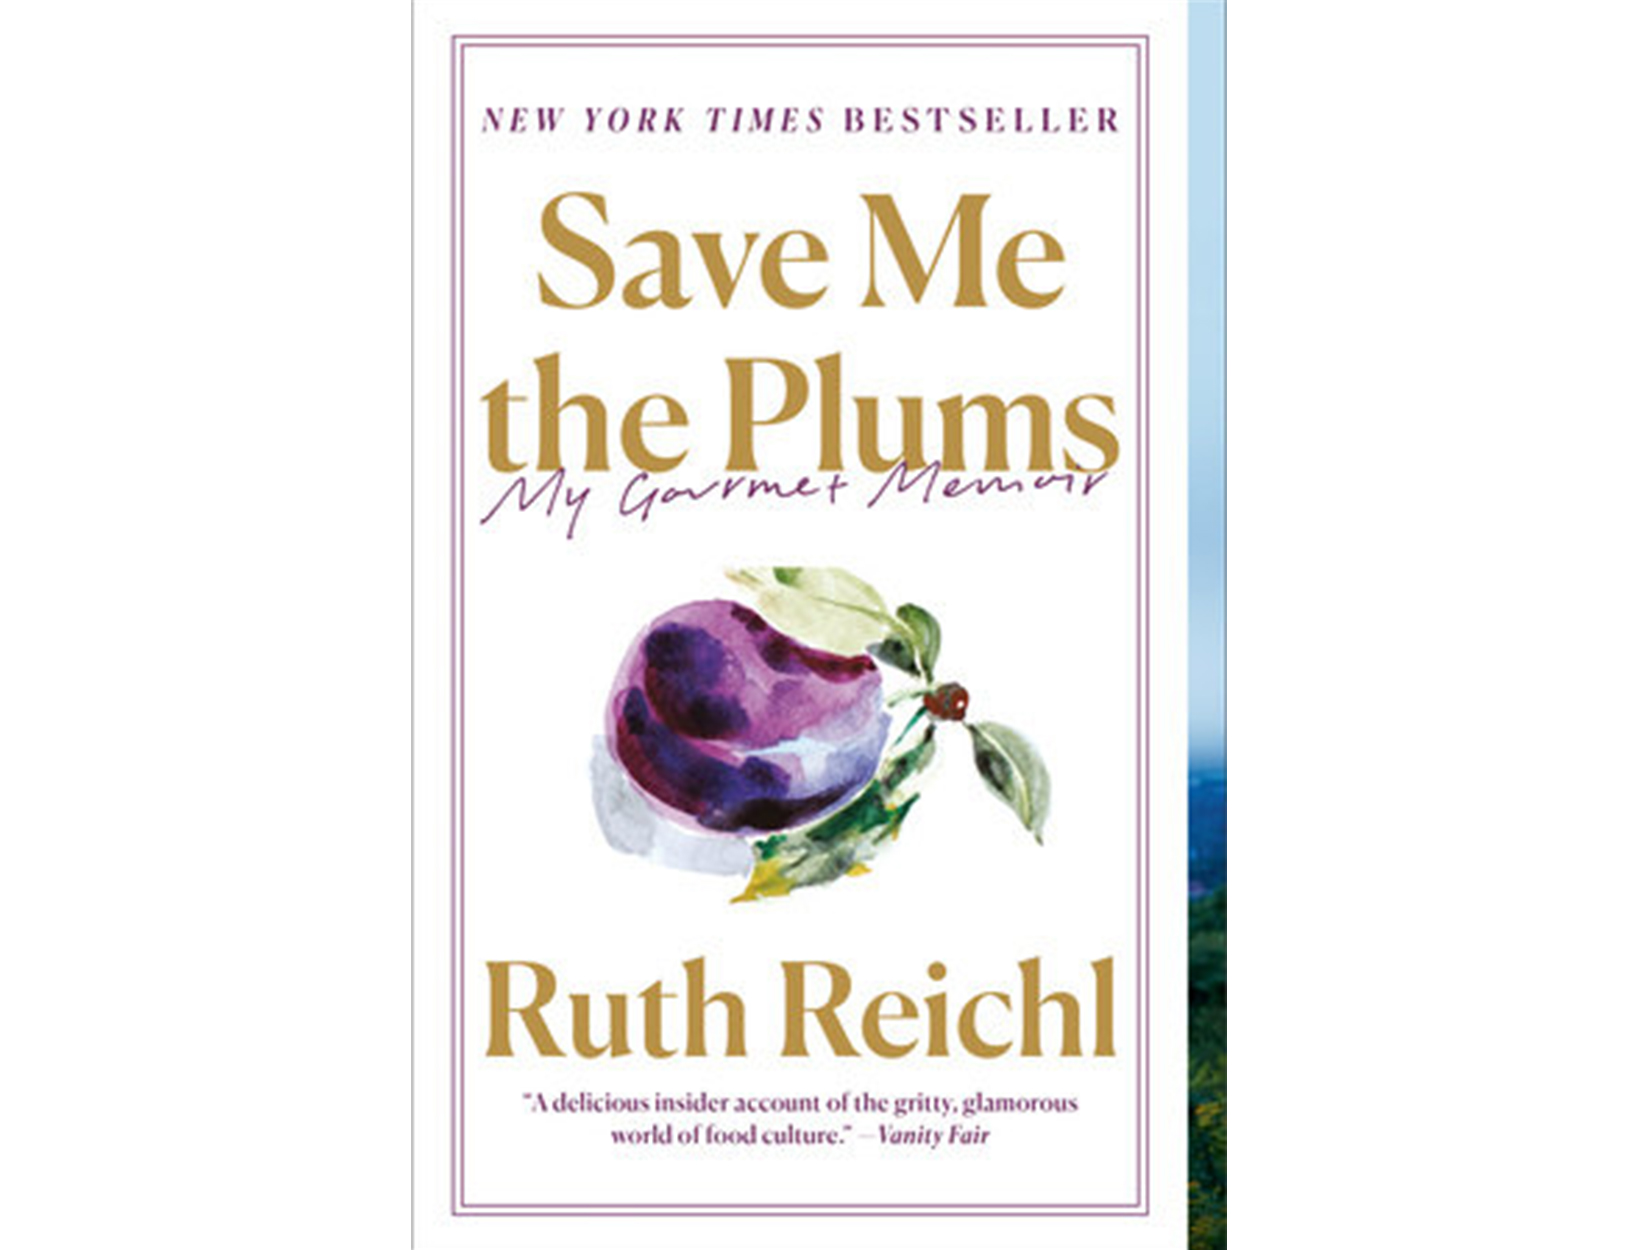 <em>Save Me the Plums</em> by Ruth Reichl